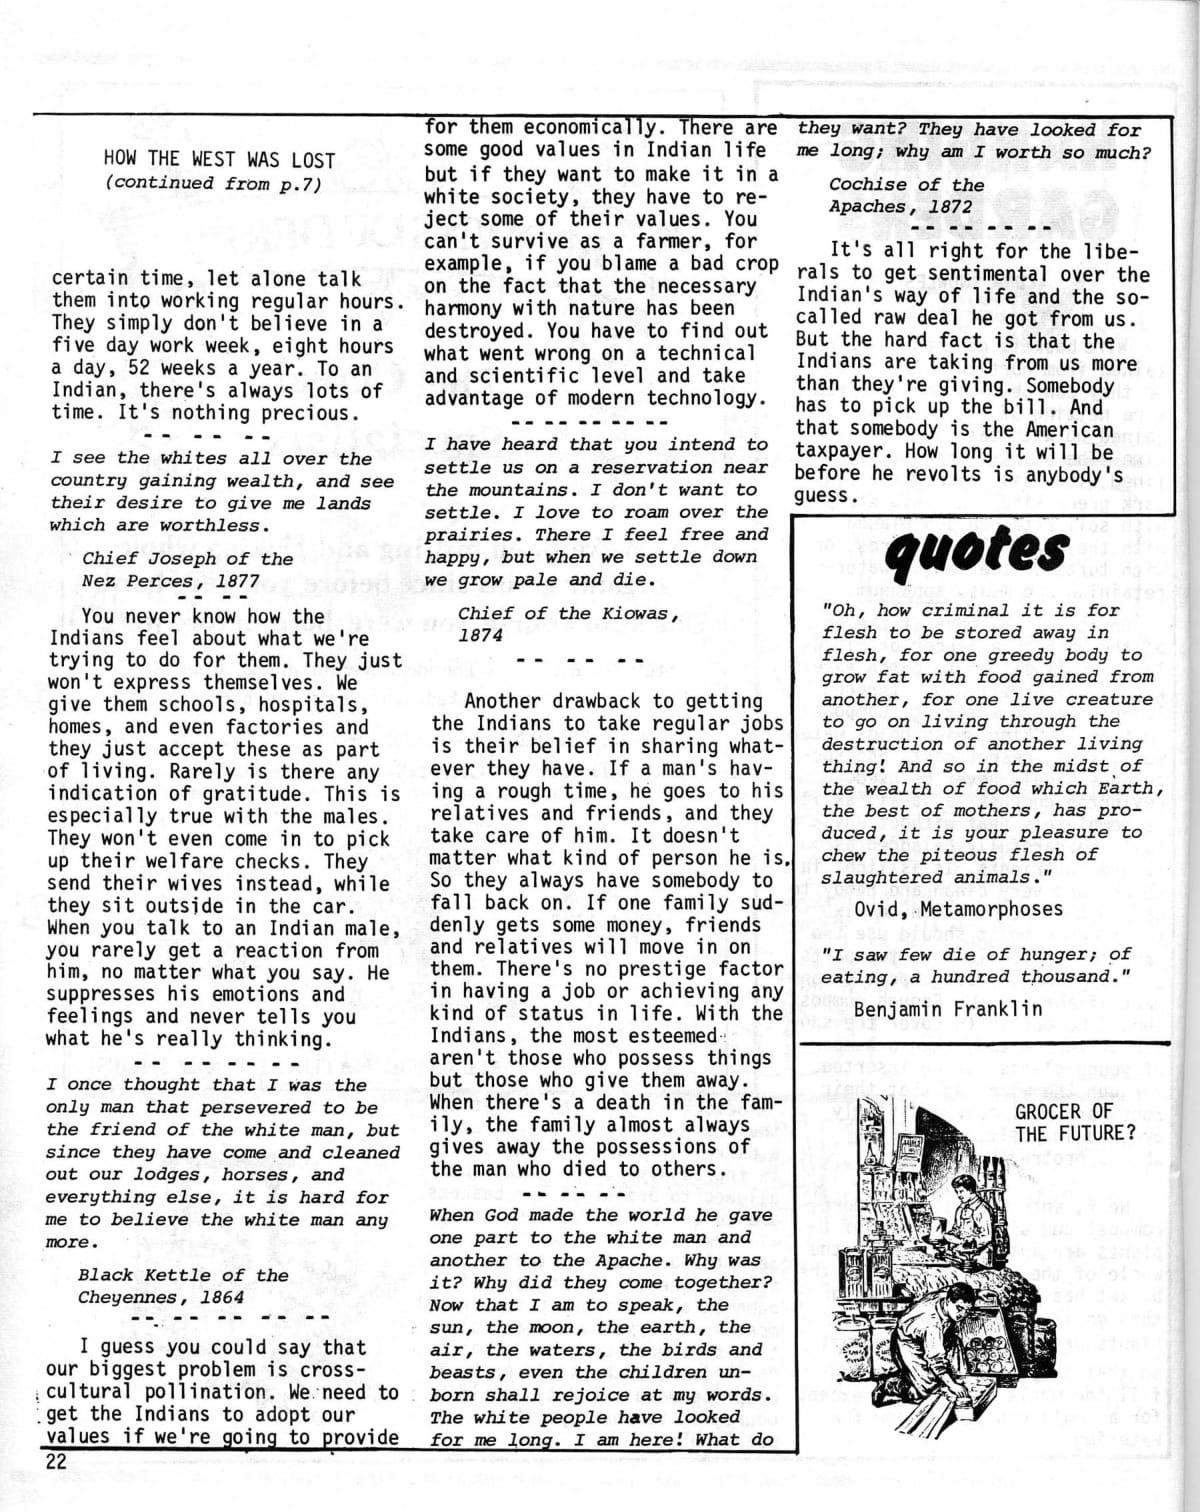 seed-v2-n1-jan1973-22.jpg